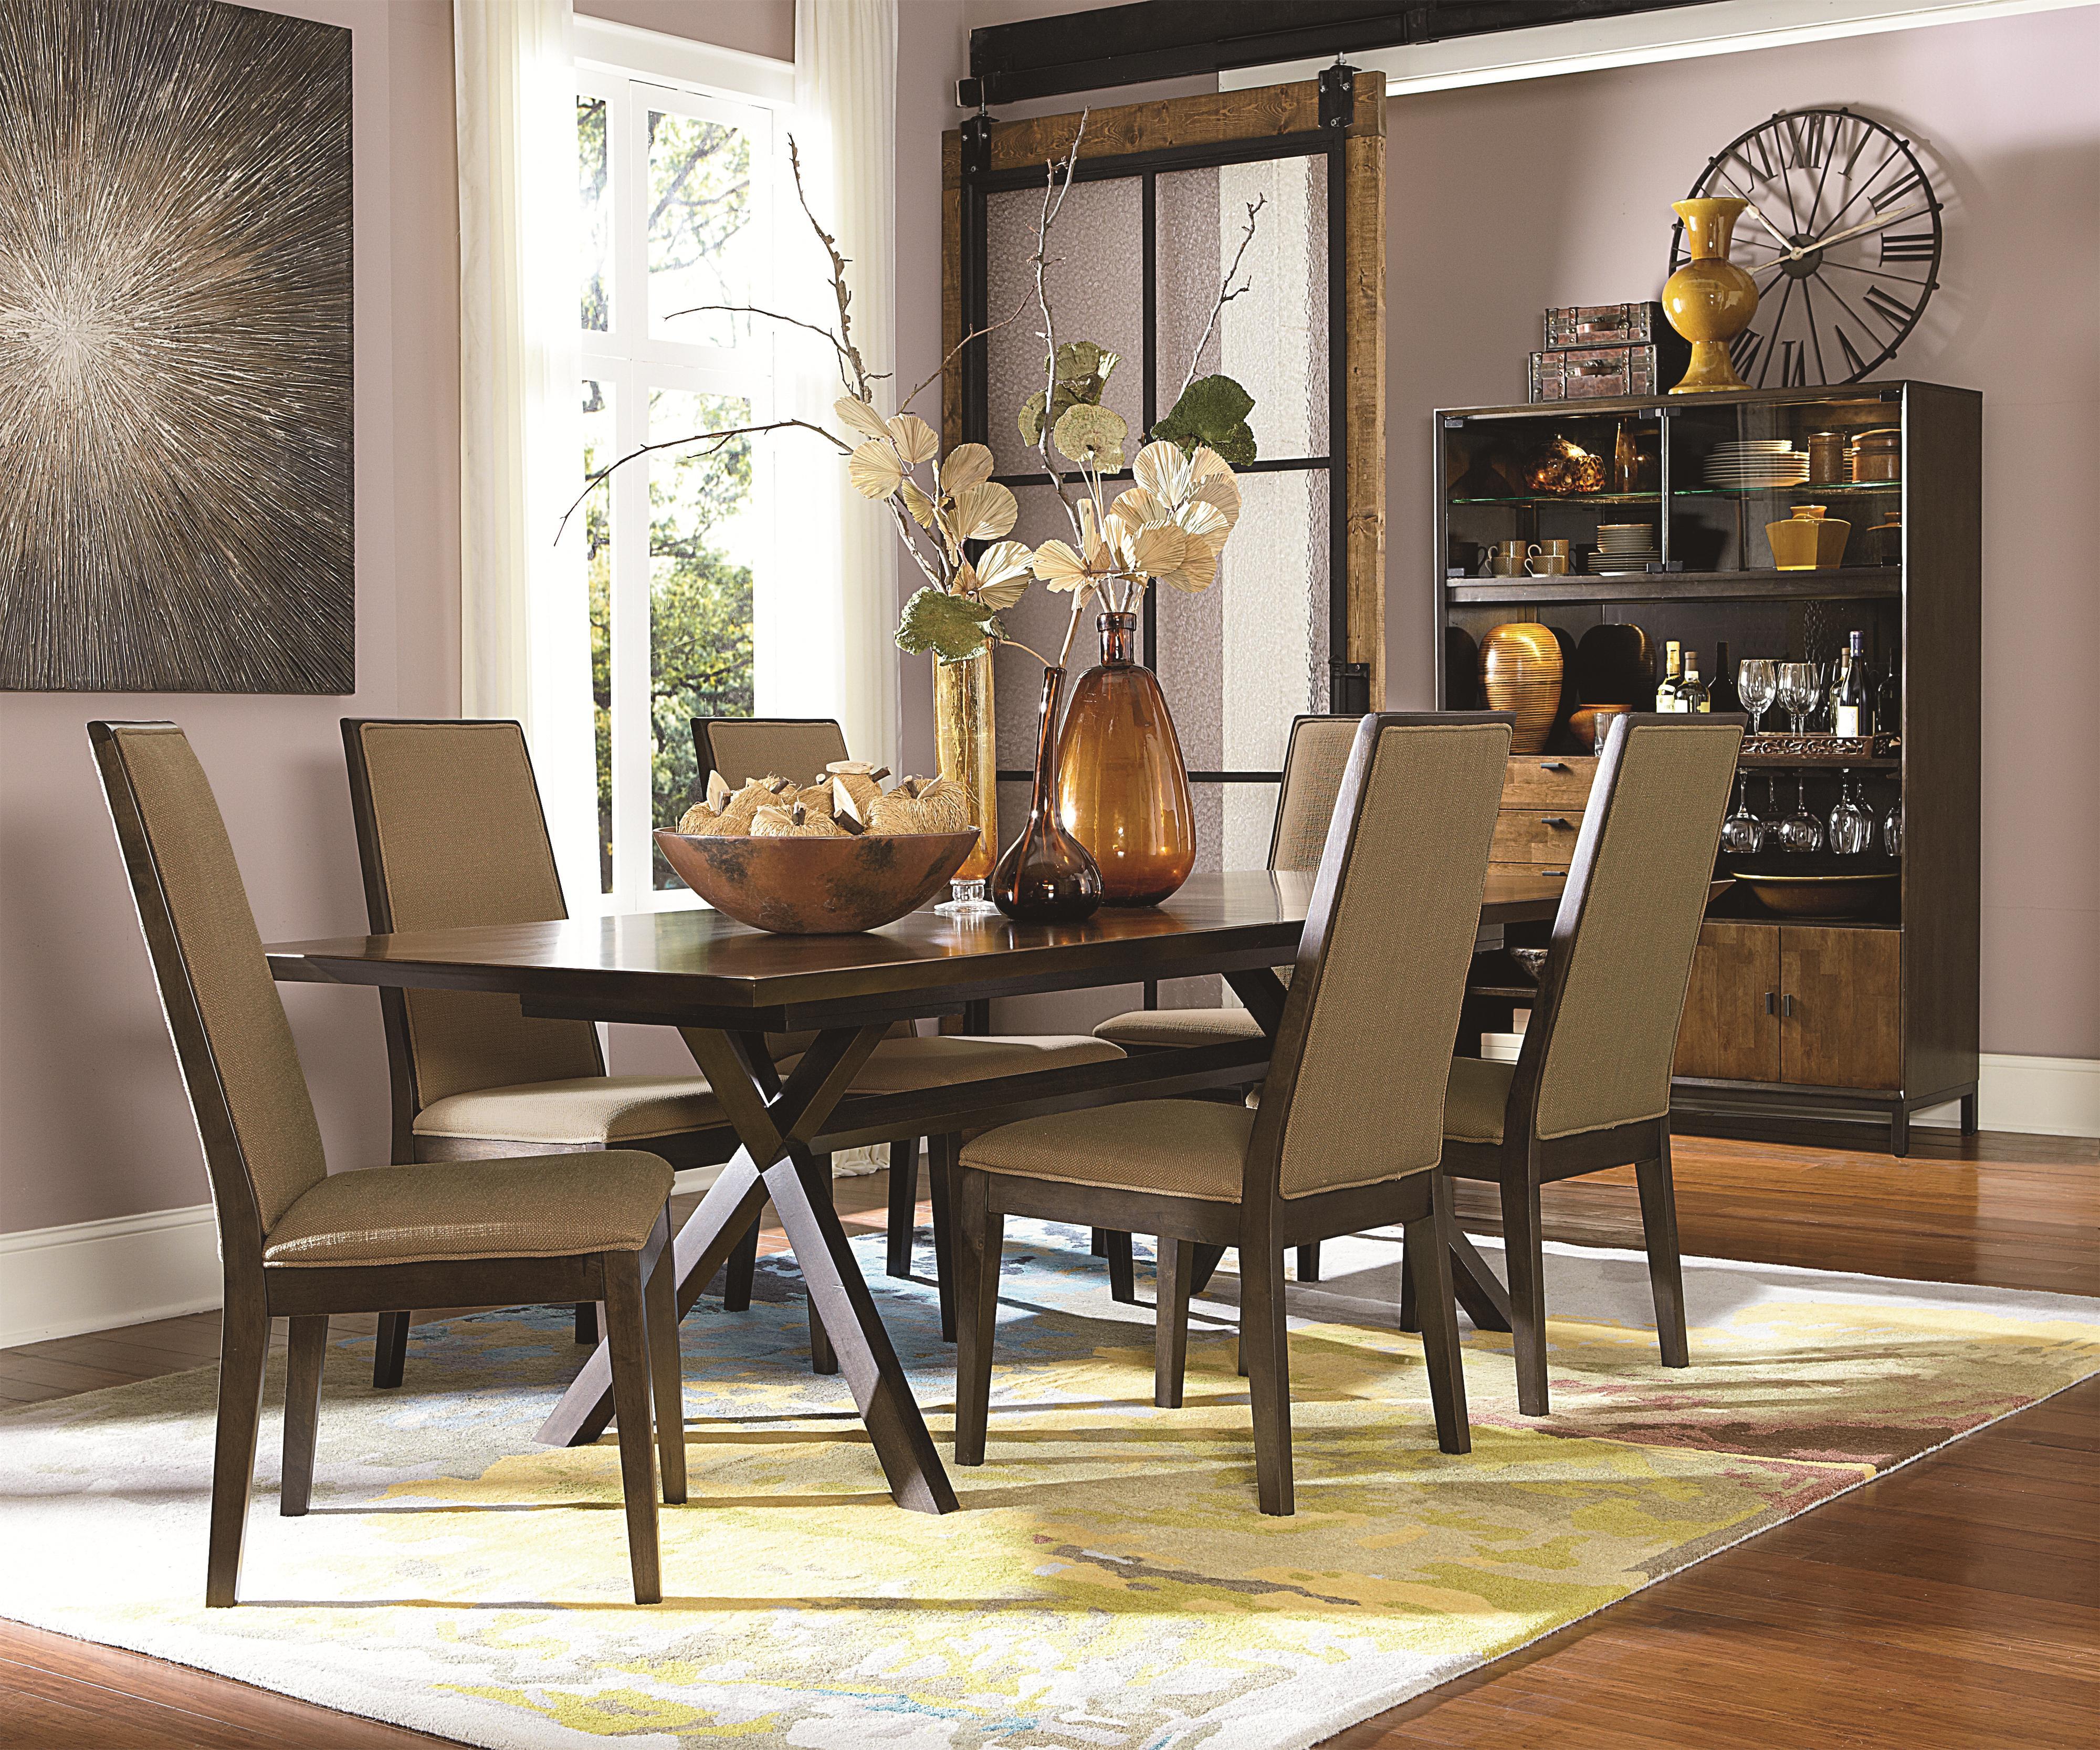 Rectangular Table With Trestle Bottom In Hazelnut Finish Extension Leaf